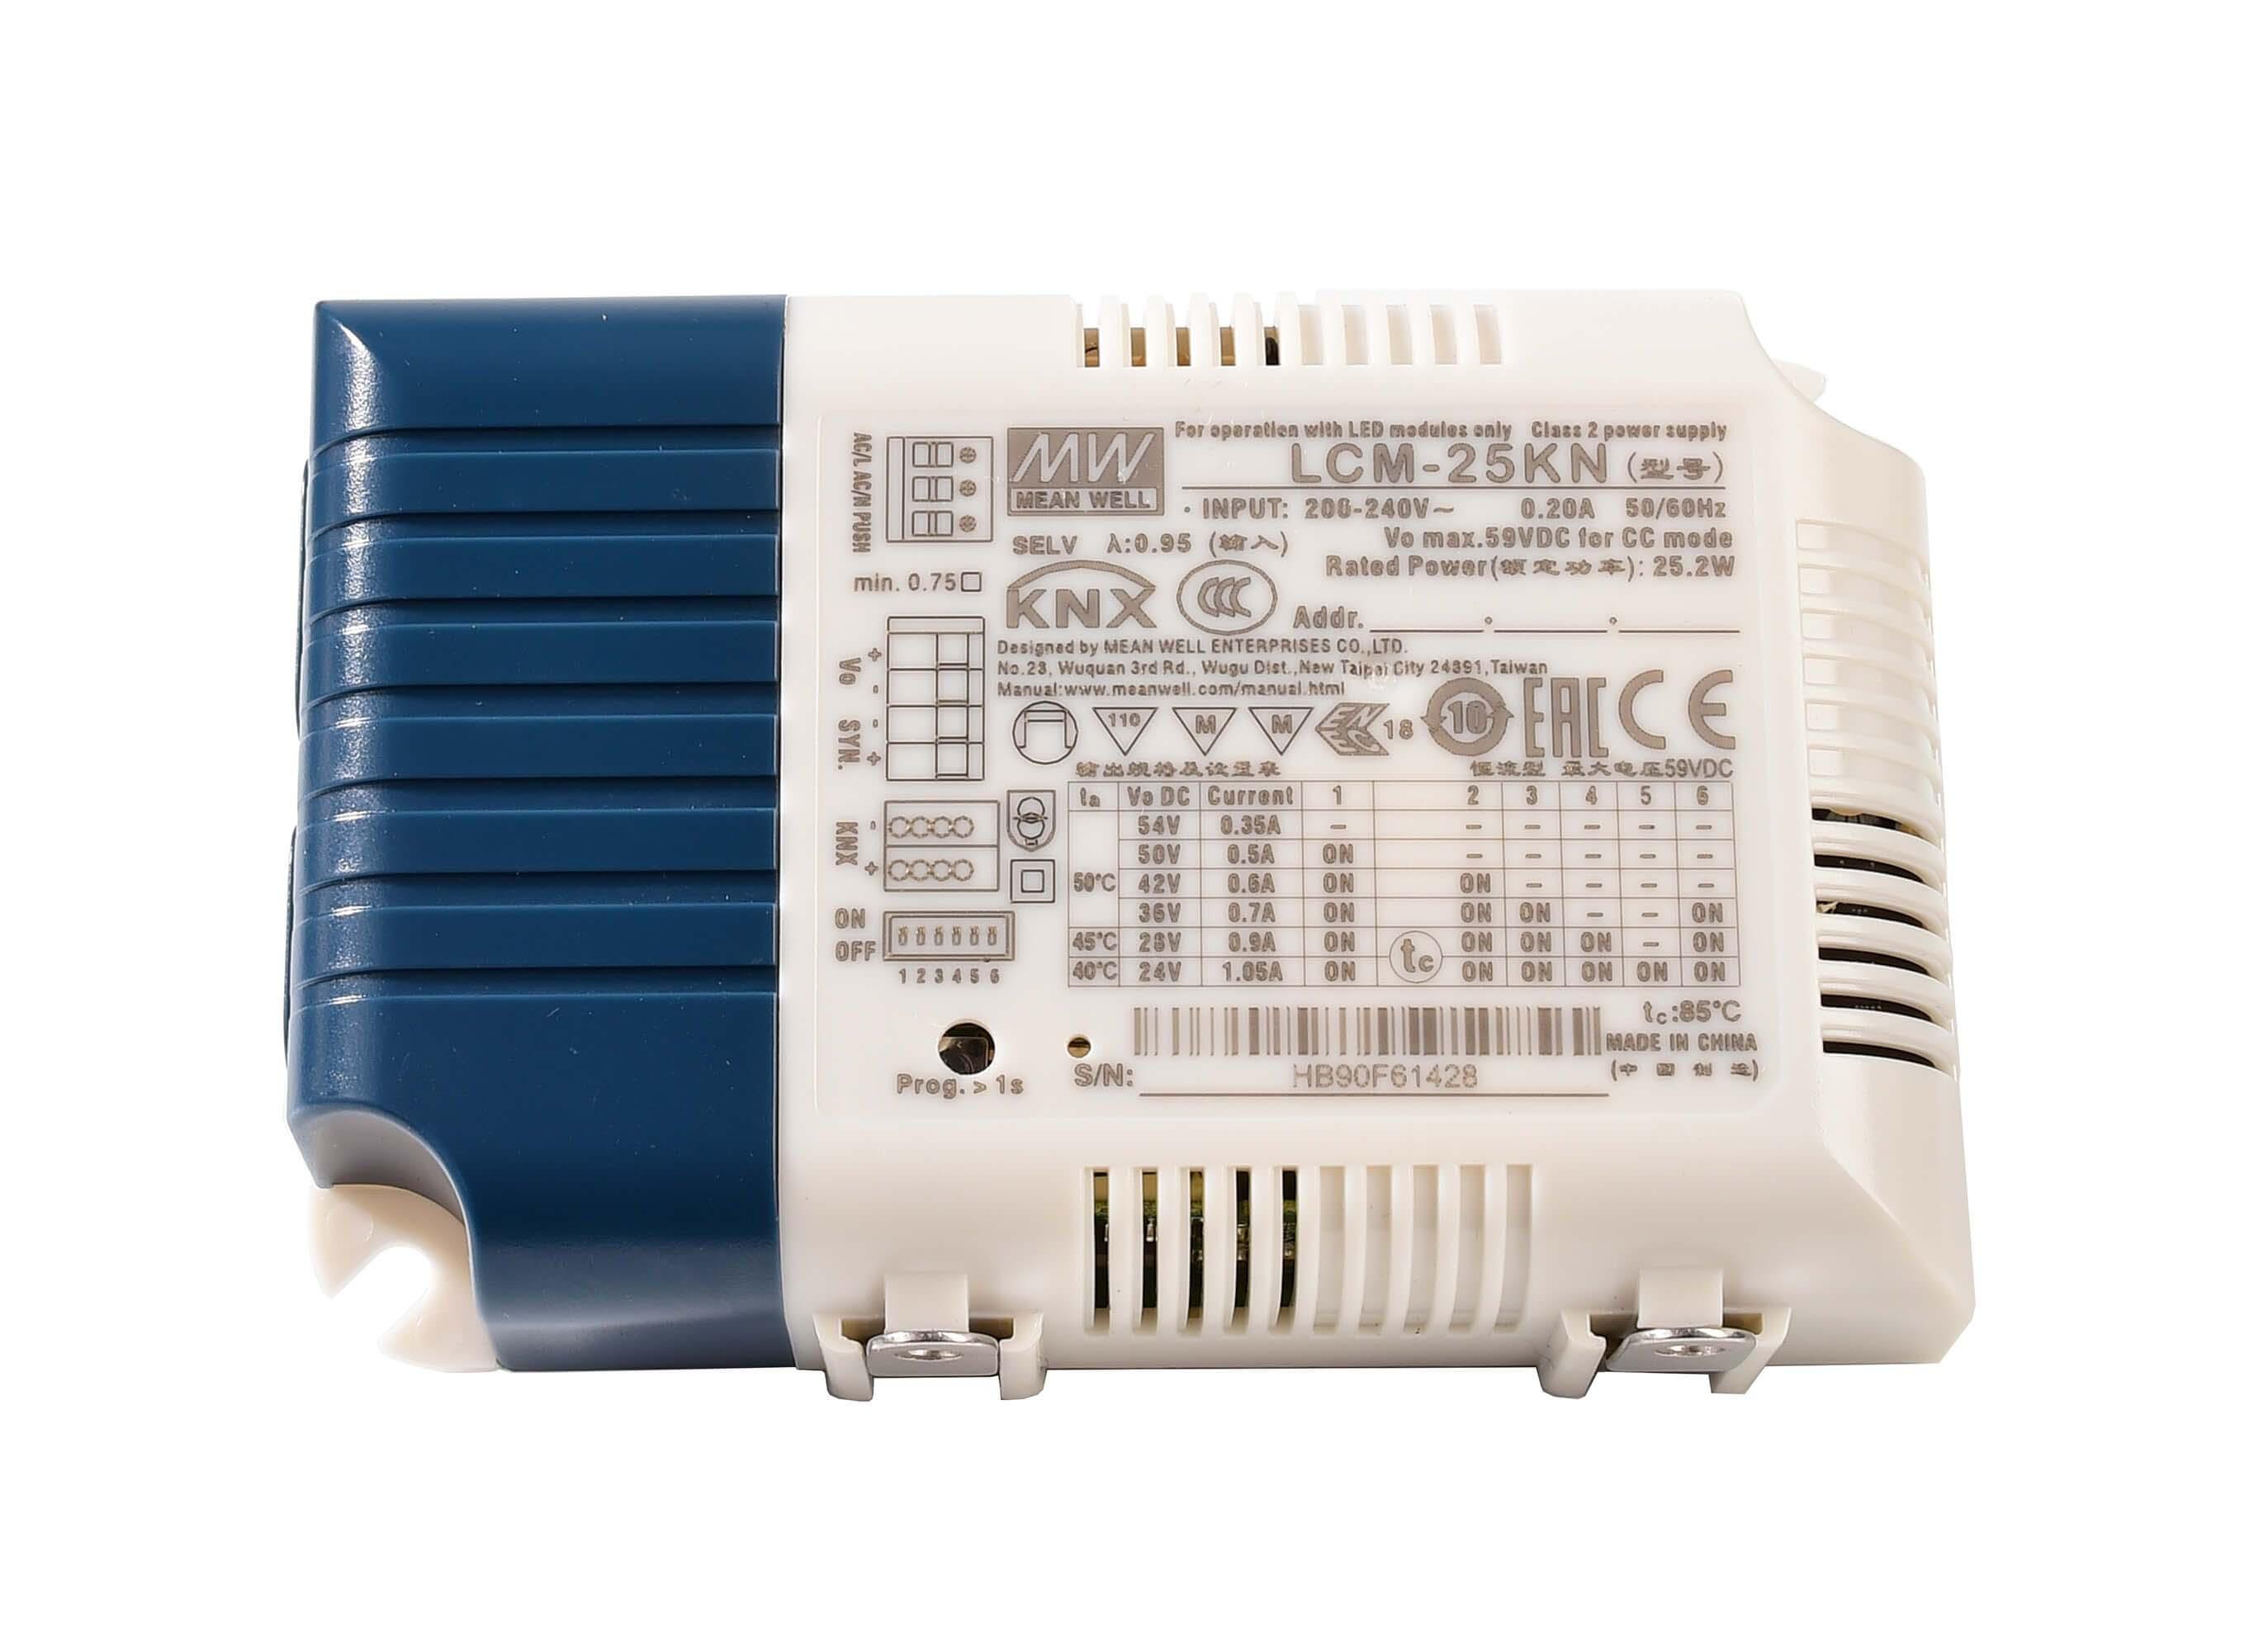 DIM, Multi CC, LCM-25KN - KNX